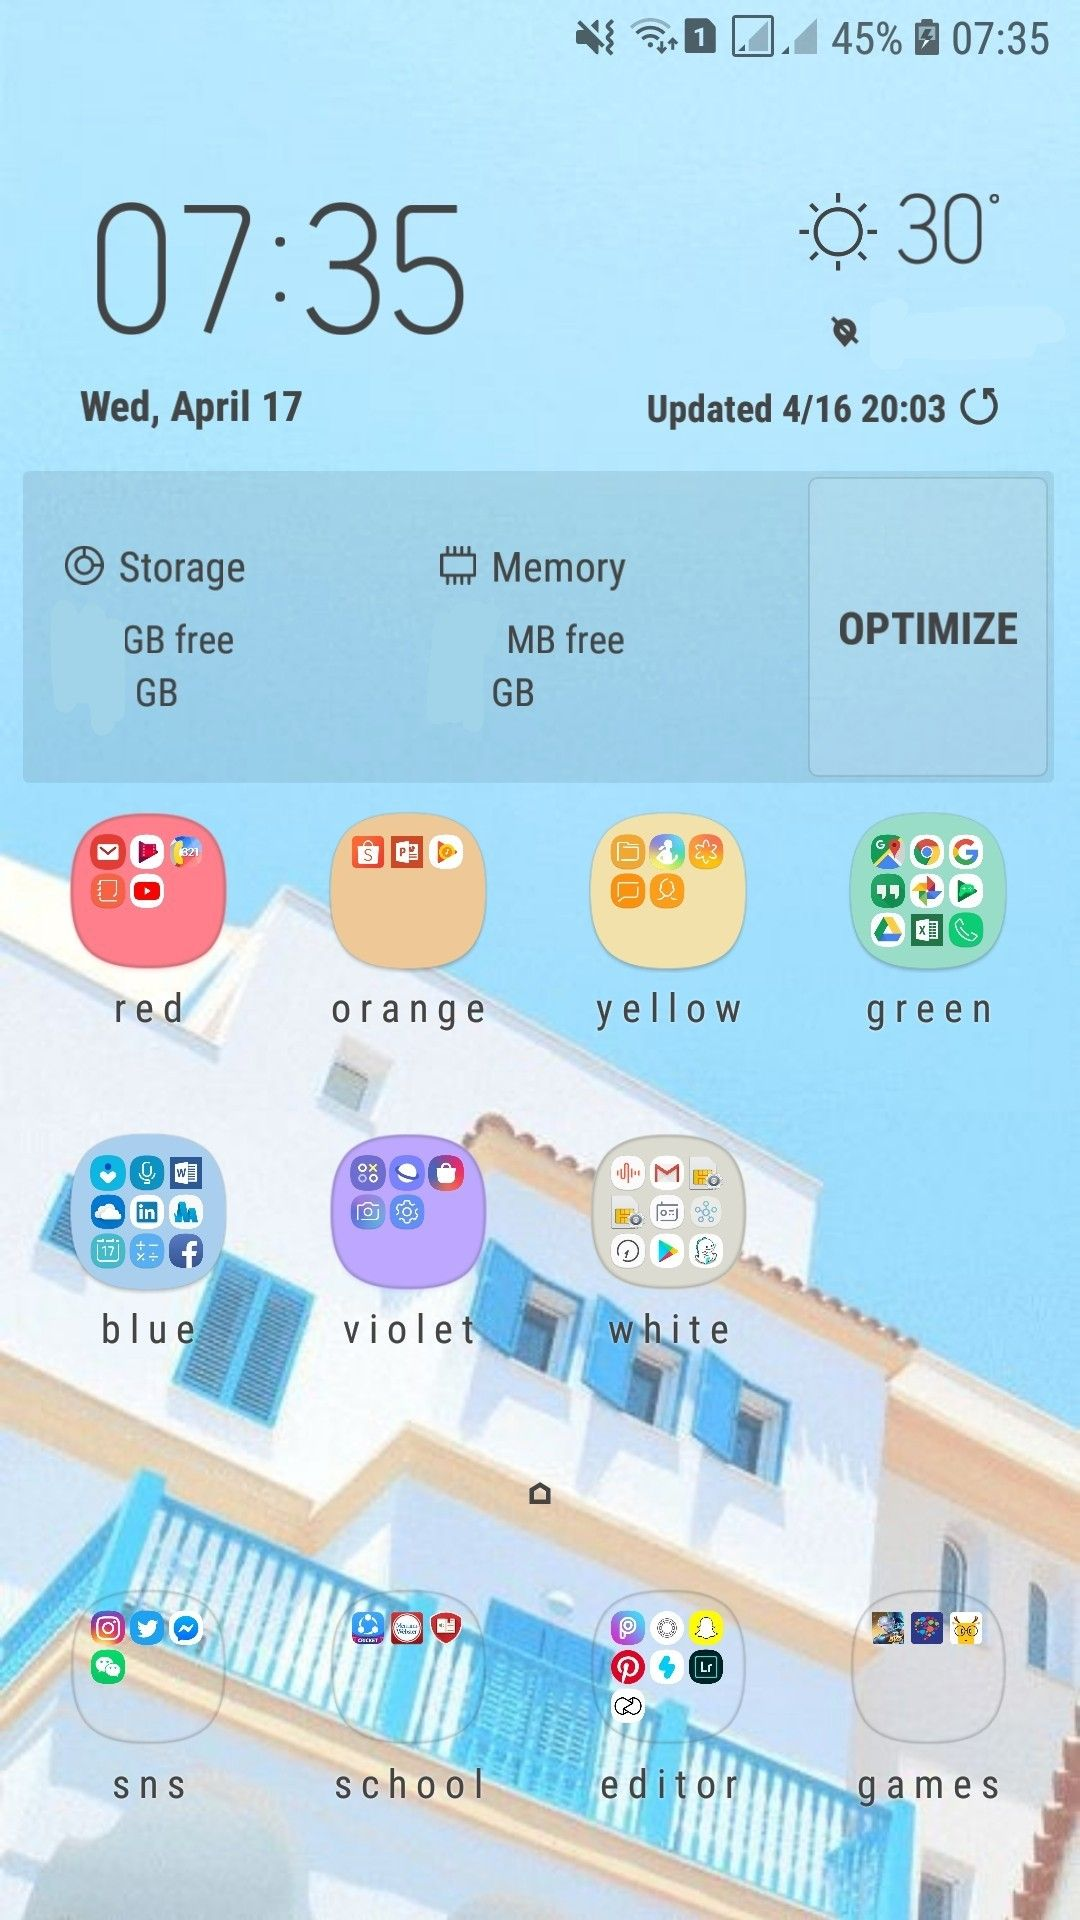 Aesthetic Phone Organization For Samsung User S Organizacao Celular Apps Android Celular Android